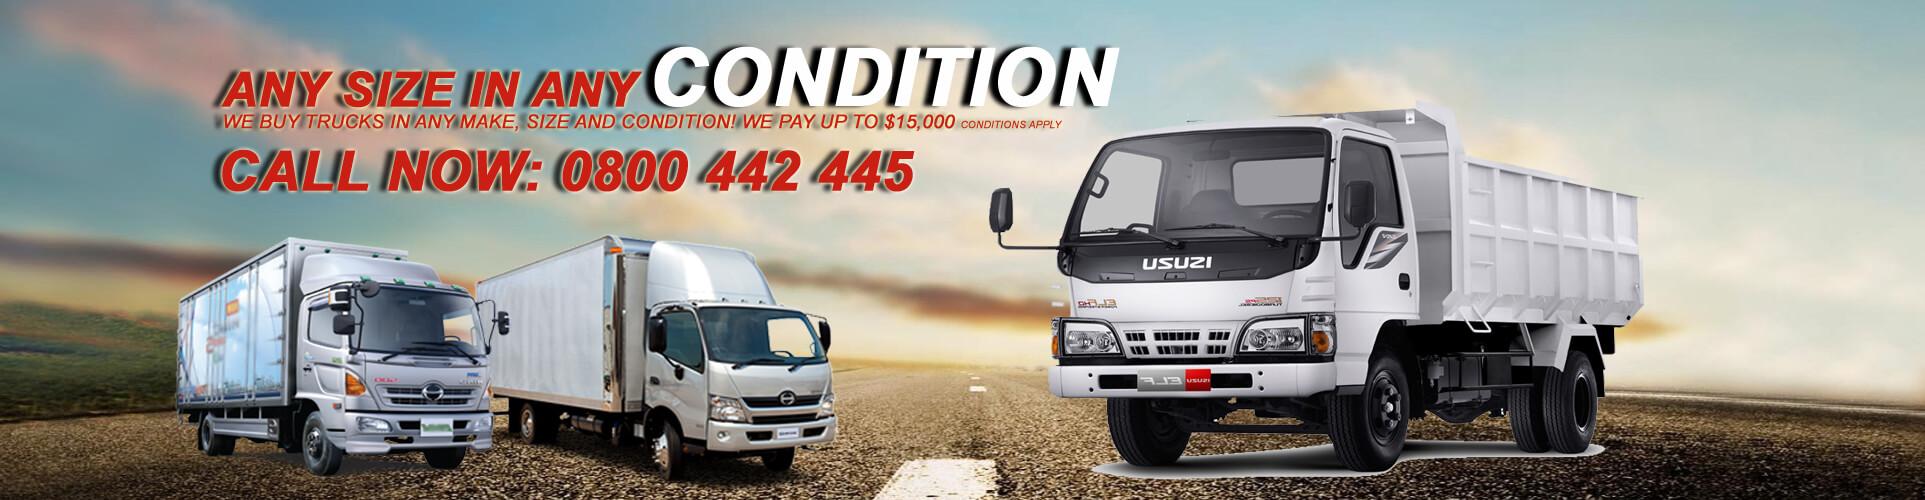 cash-for-trucks-Auckland - Truck Buyers